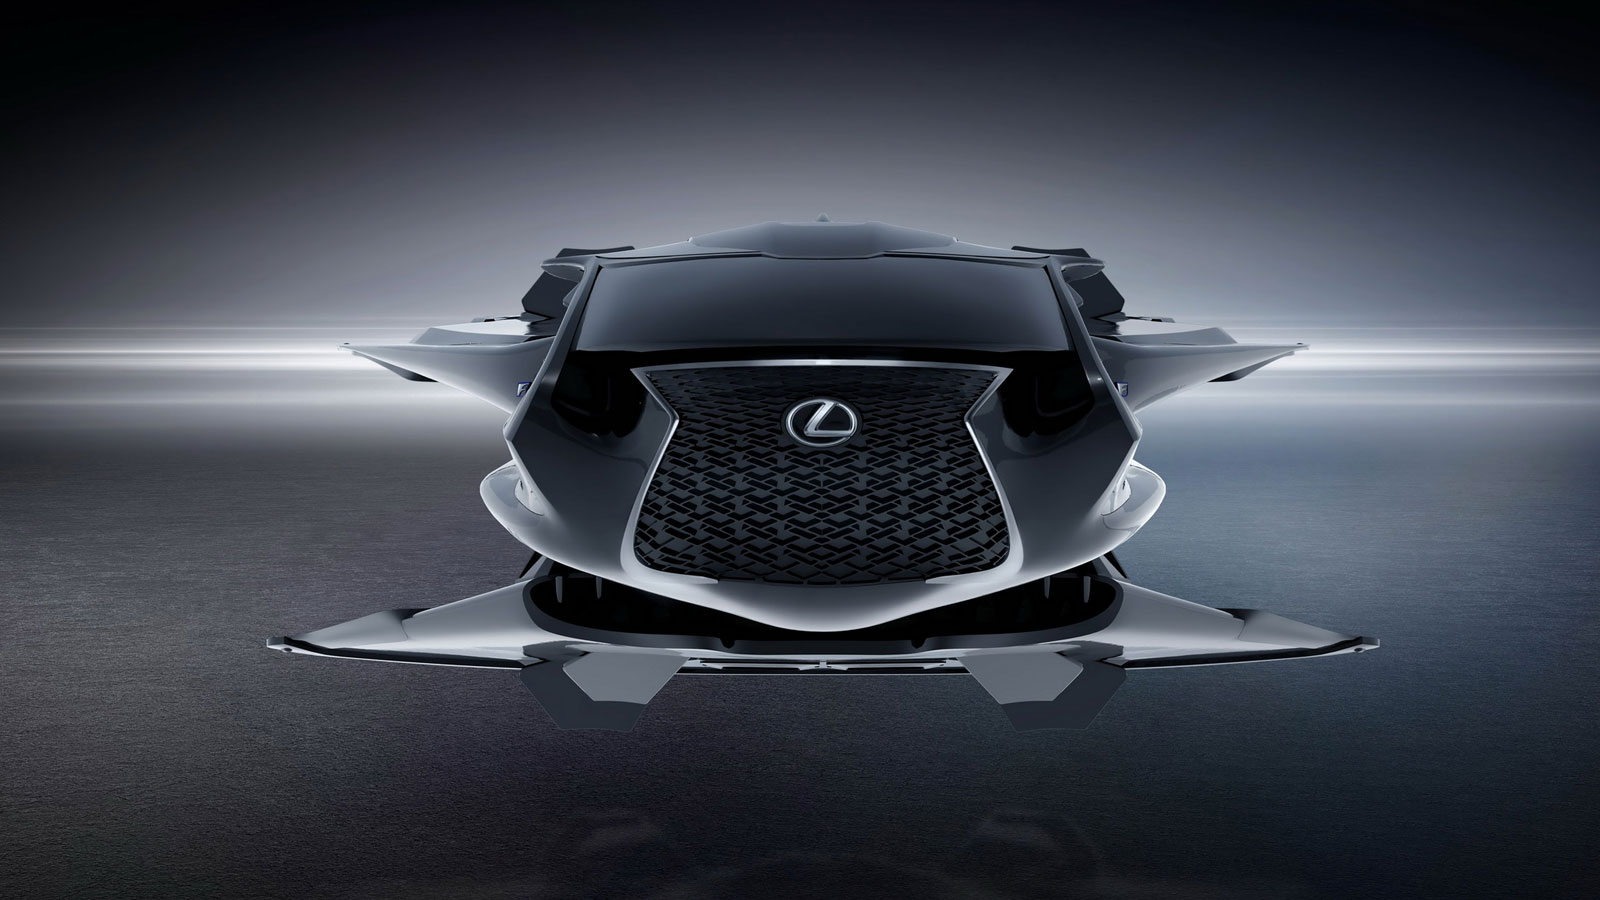 Men in Black International Lexus Jet Concept - Car Body Design